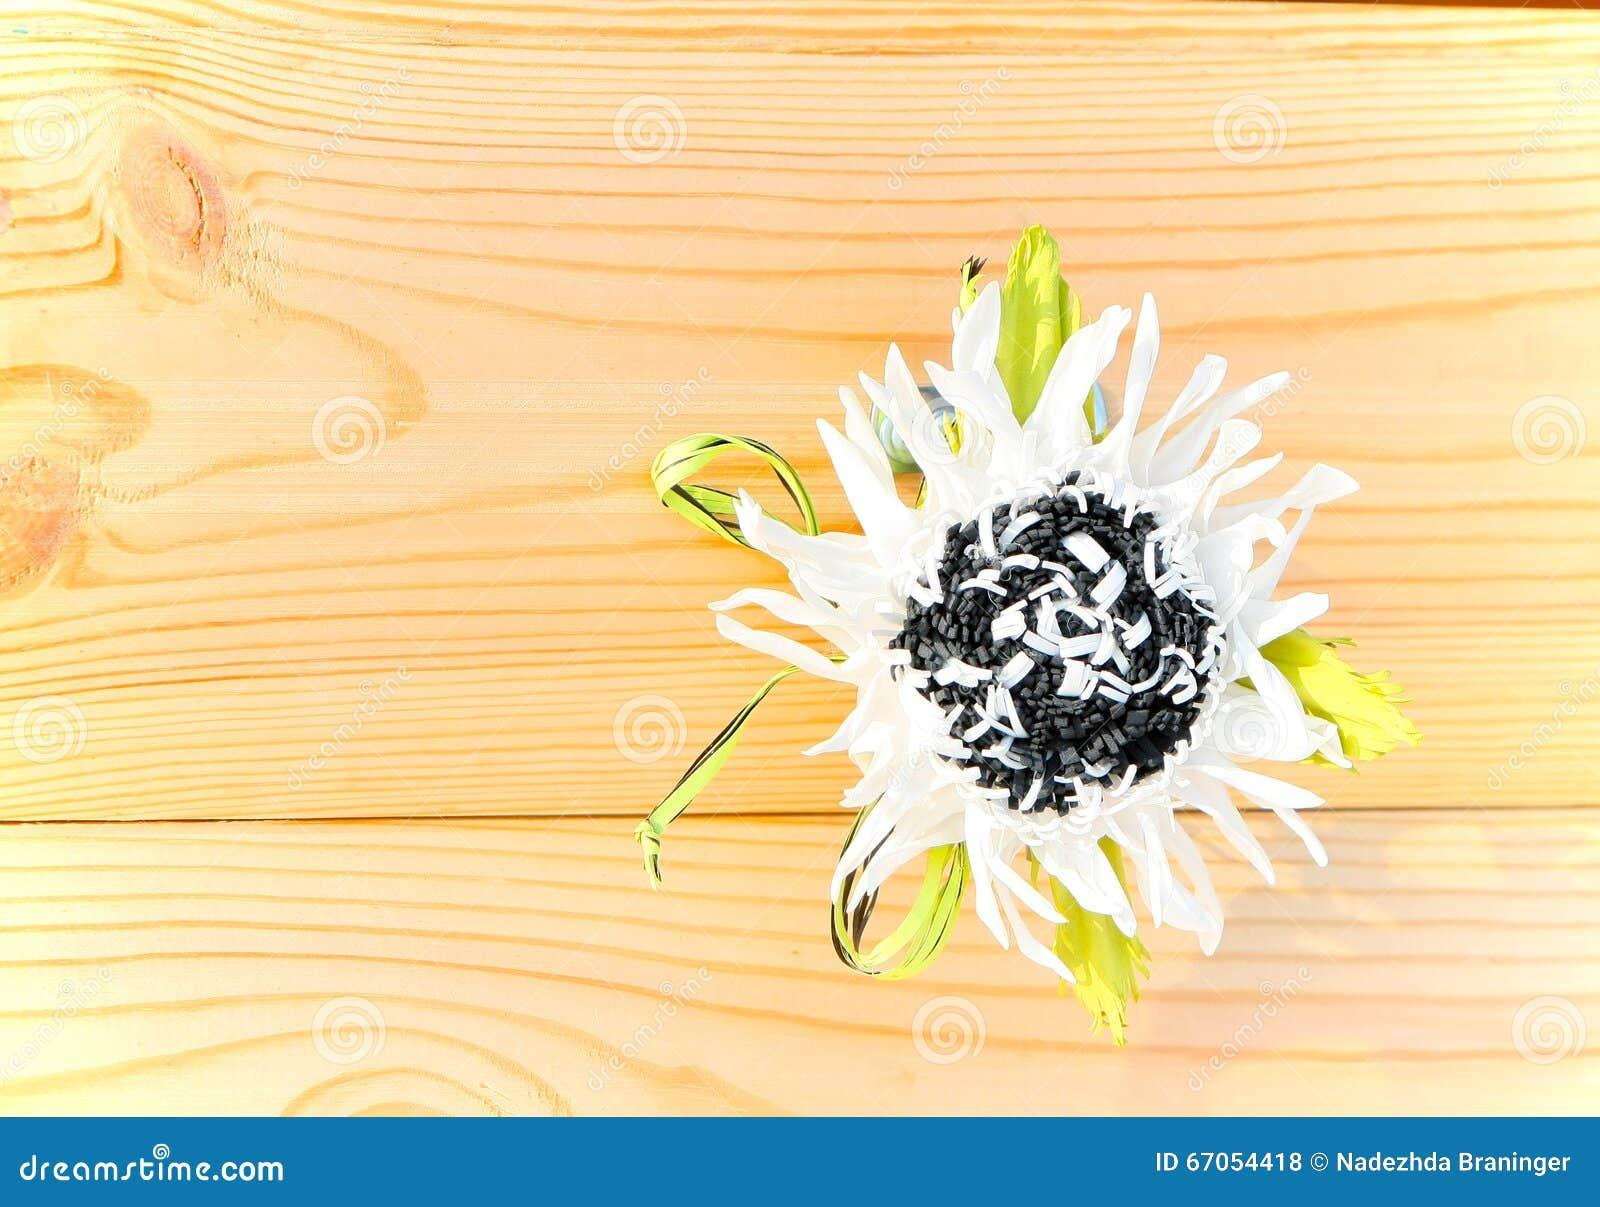 White Flower Of Foamirana Stock Photo Image Of Foamiran 67054418